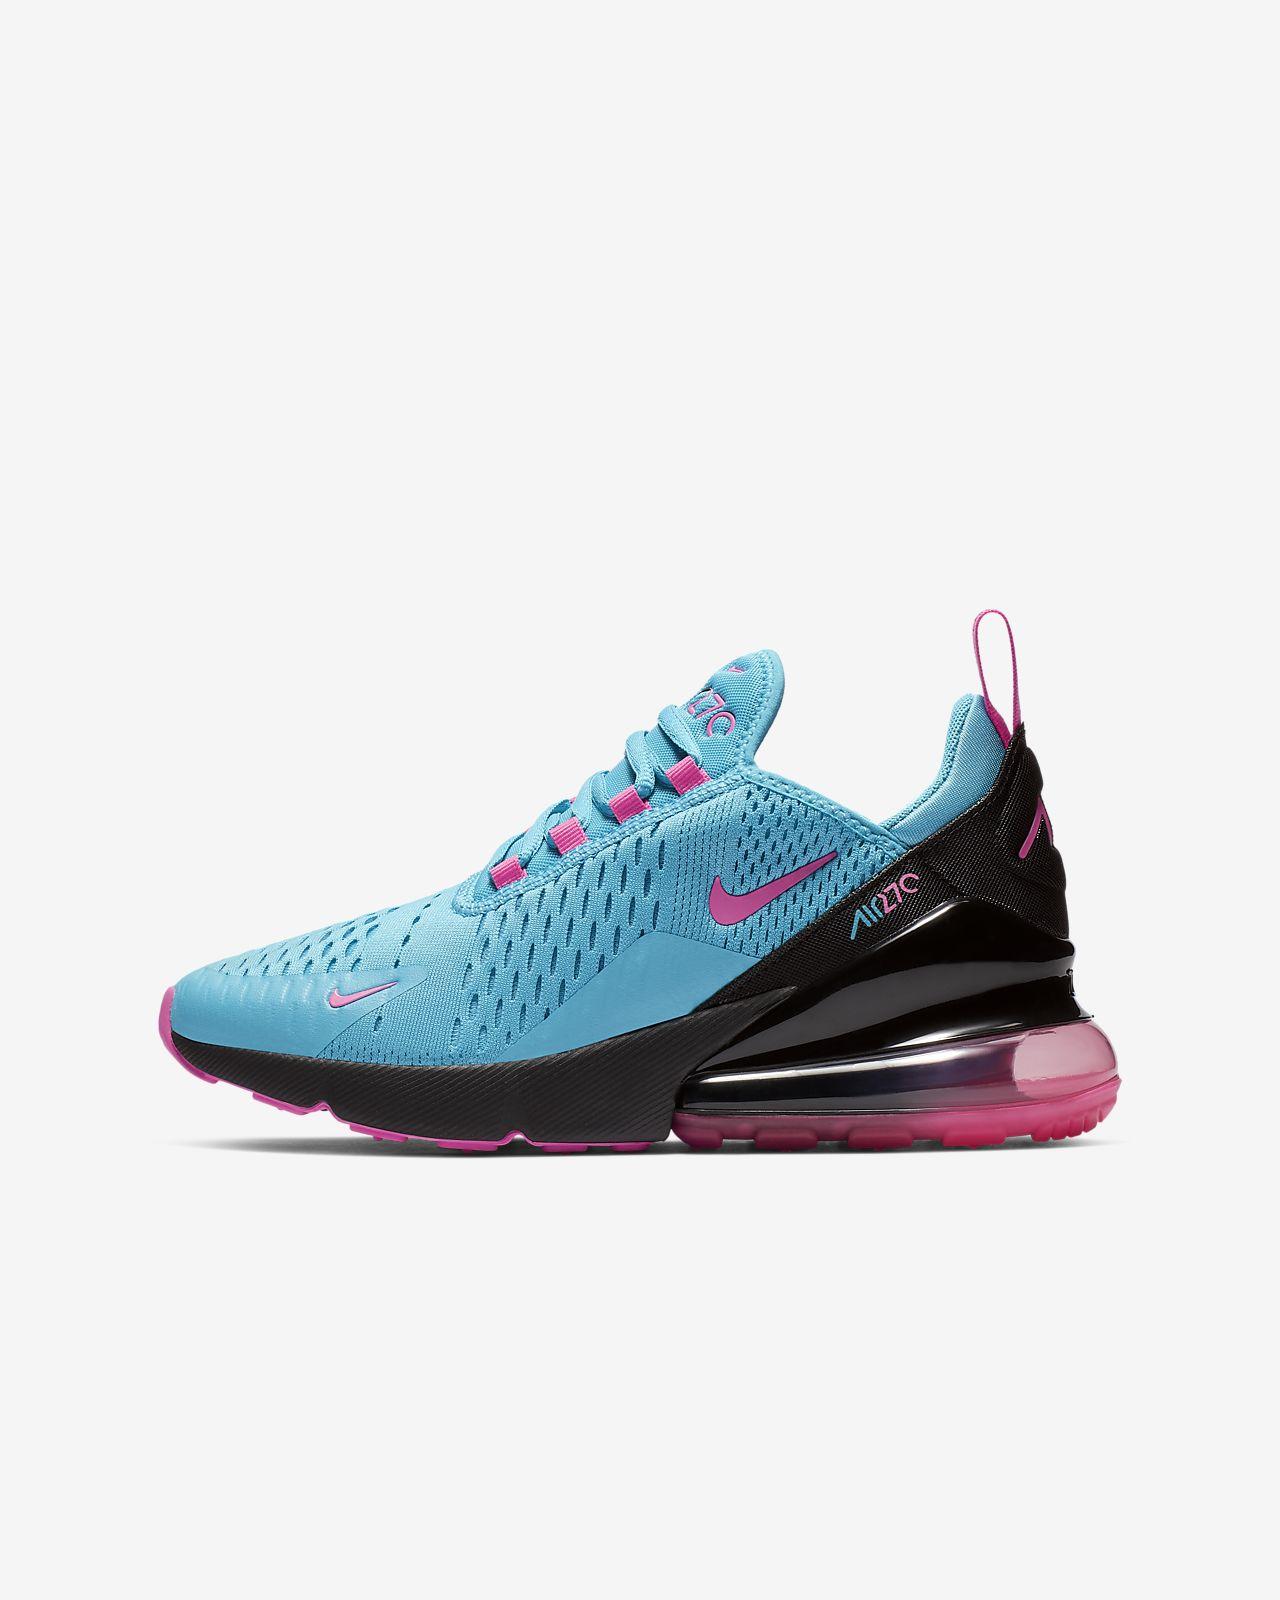 sports shoes 898b1 39eb2 ... Air Max 270 Zapatillas - Niñoa